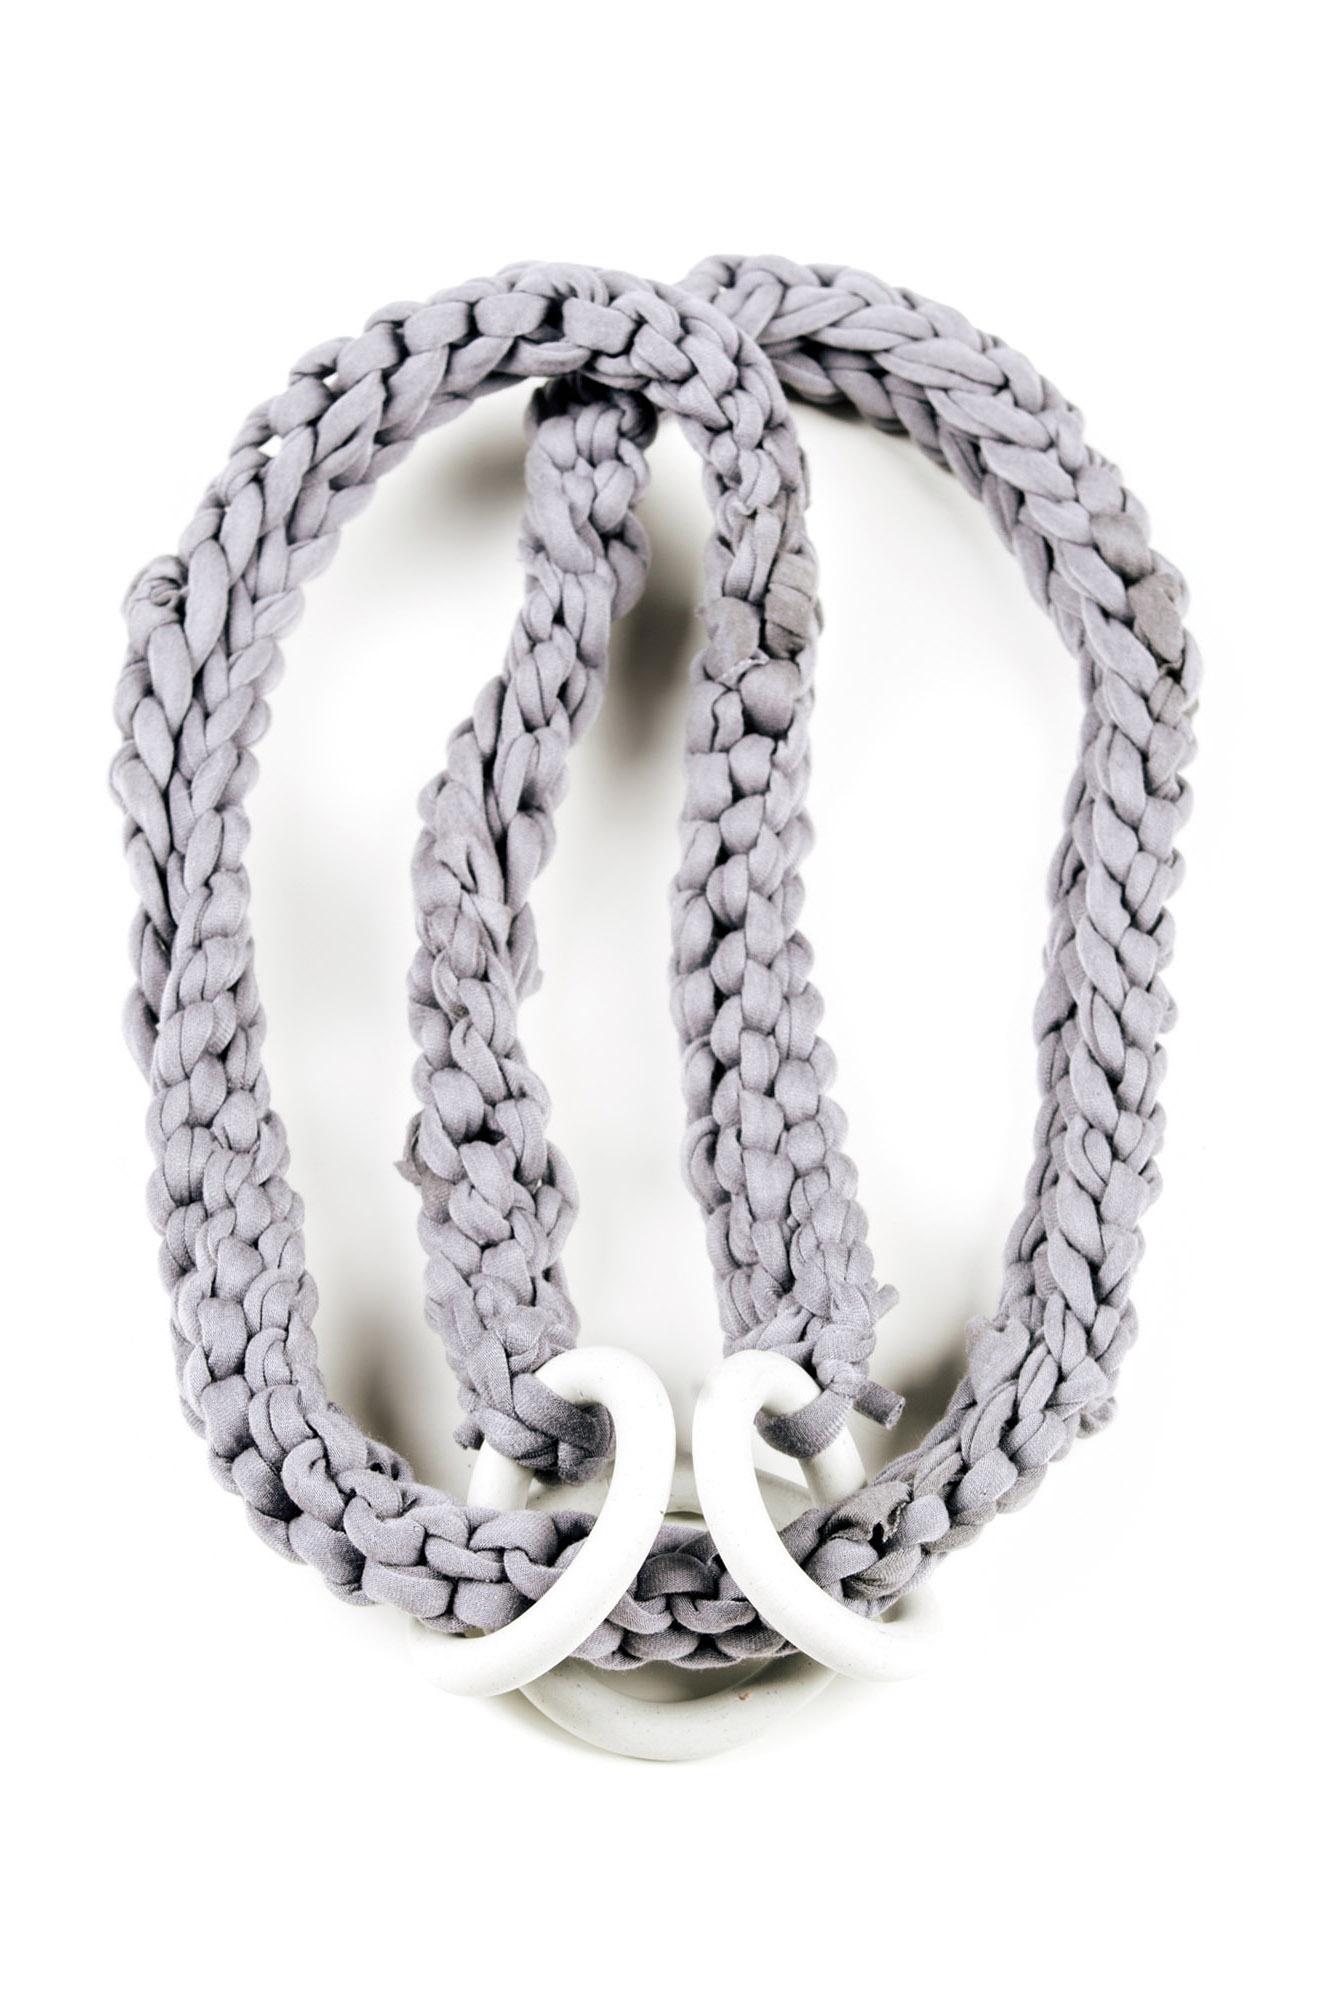 Bocco necklace by Anna Borshi 10.jpg